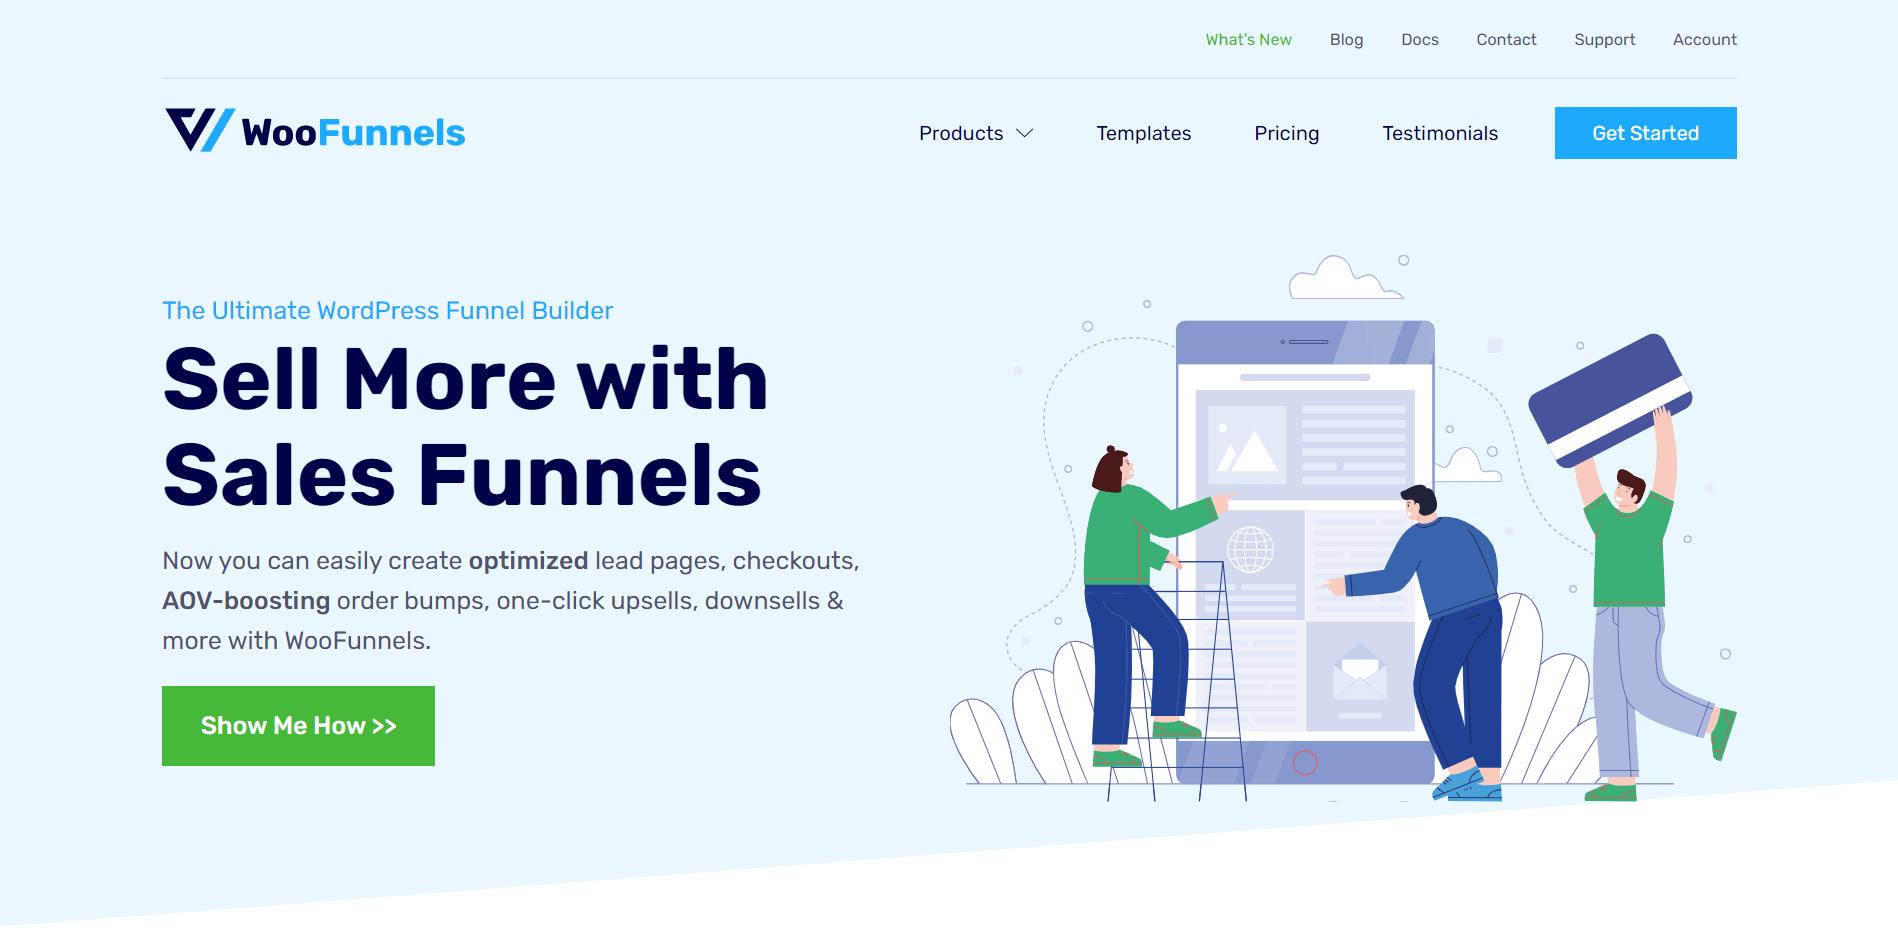 WooFunnels website using Oxygen Builder